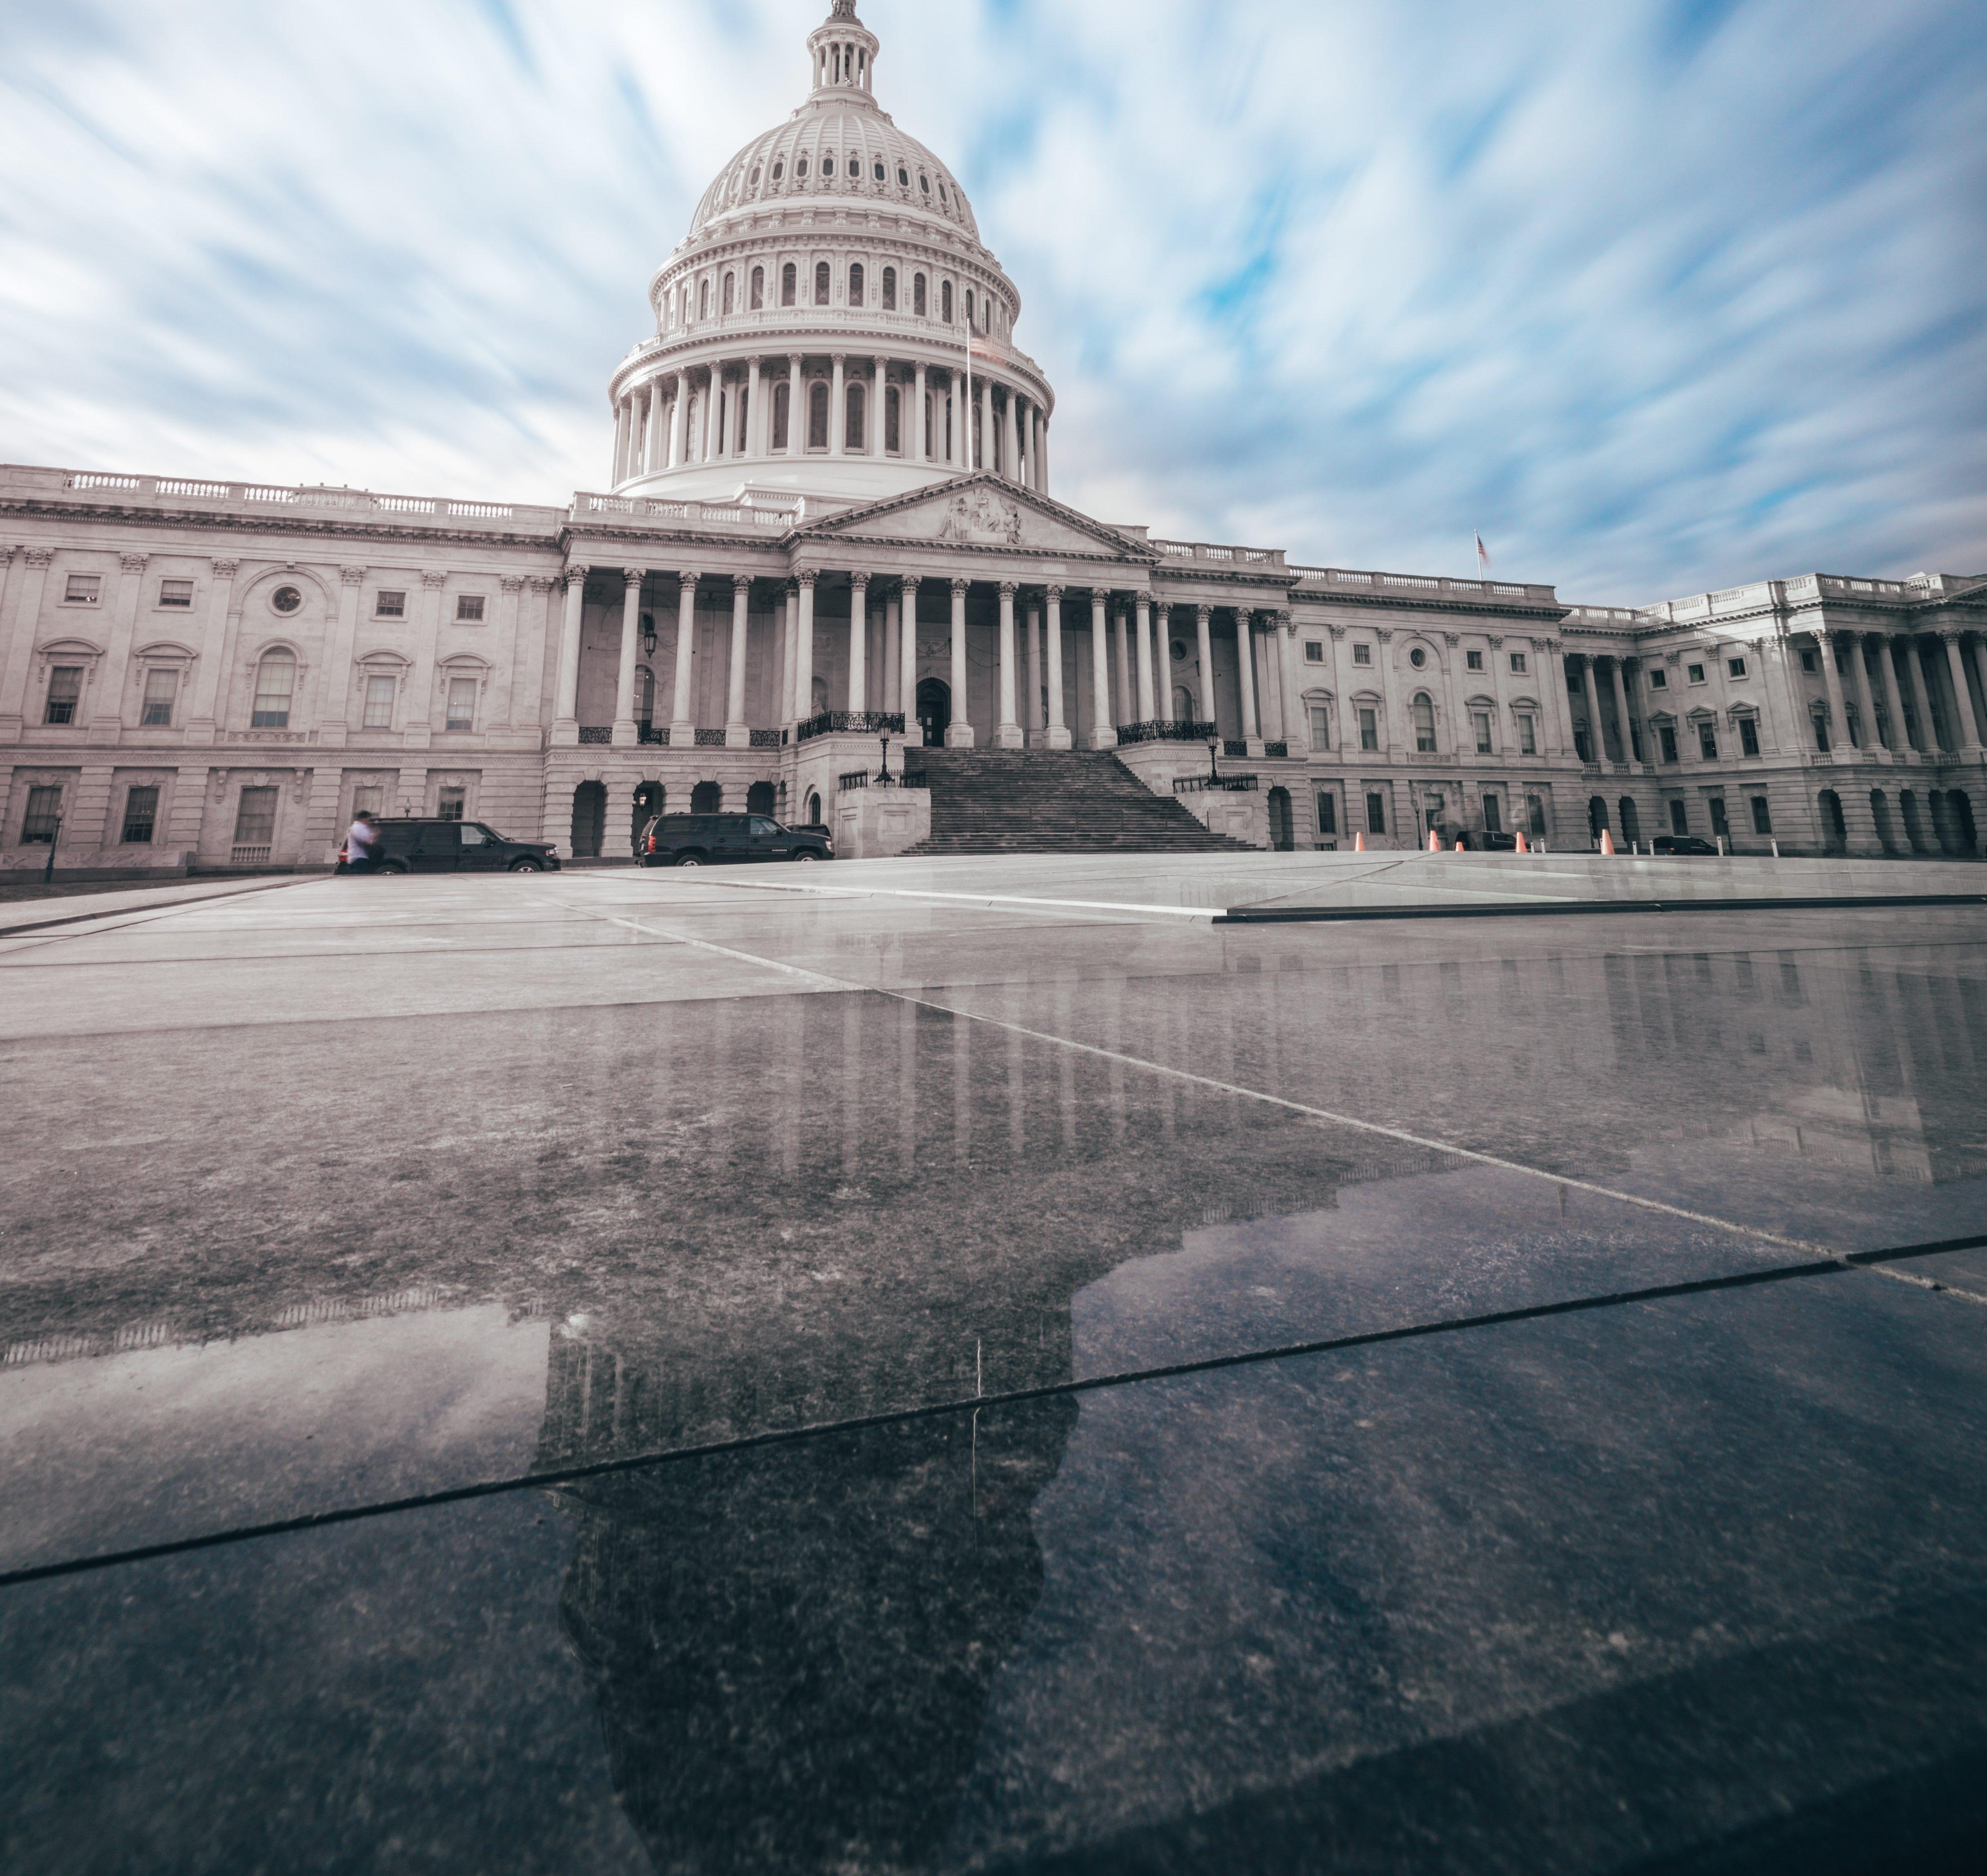 Politicians Still Attacking the Pro-Life Hyde Amendment